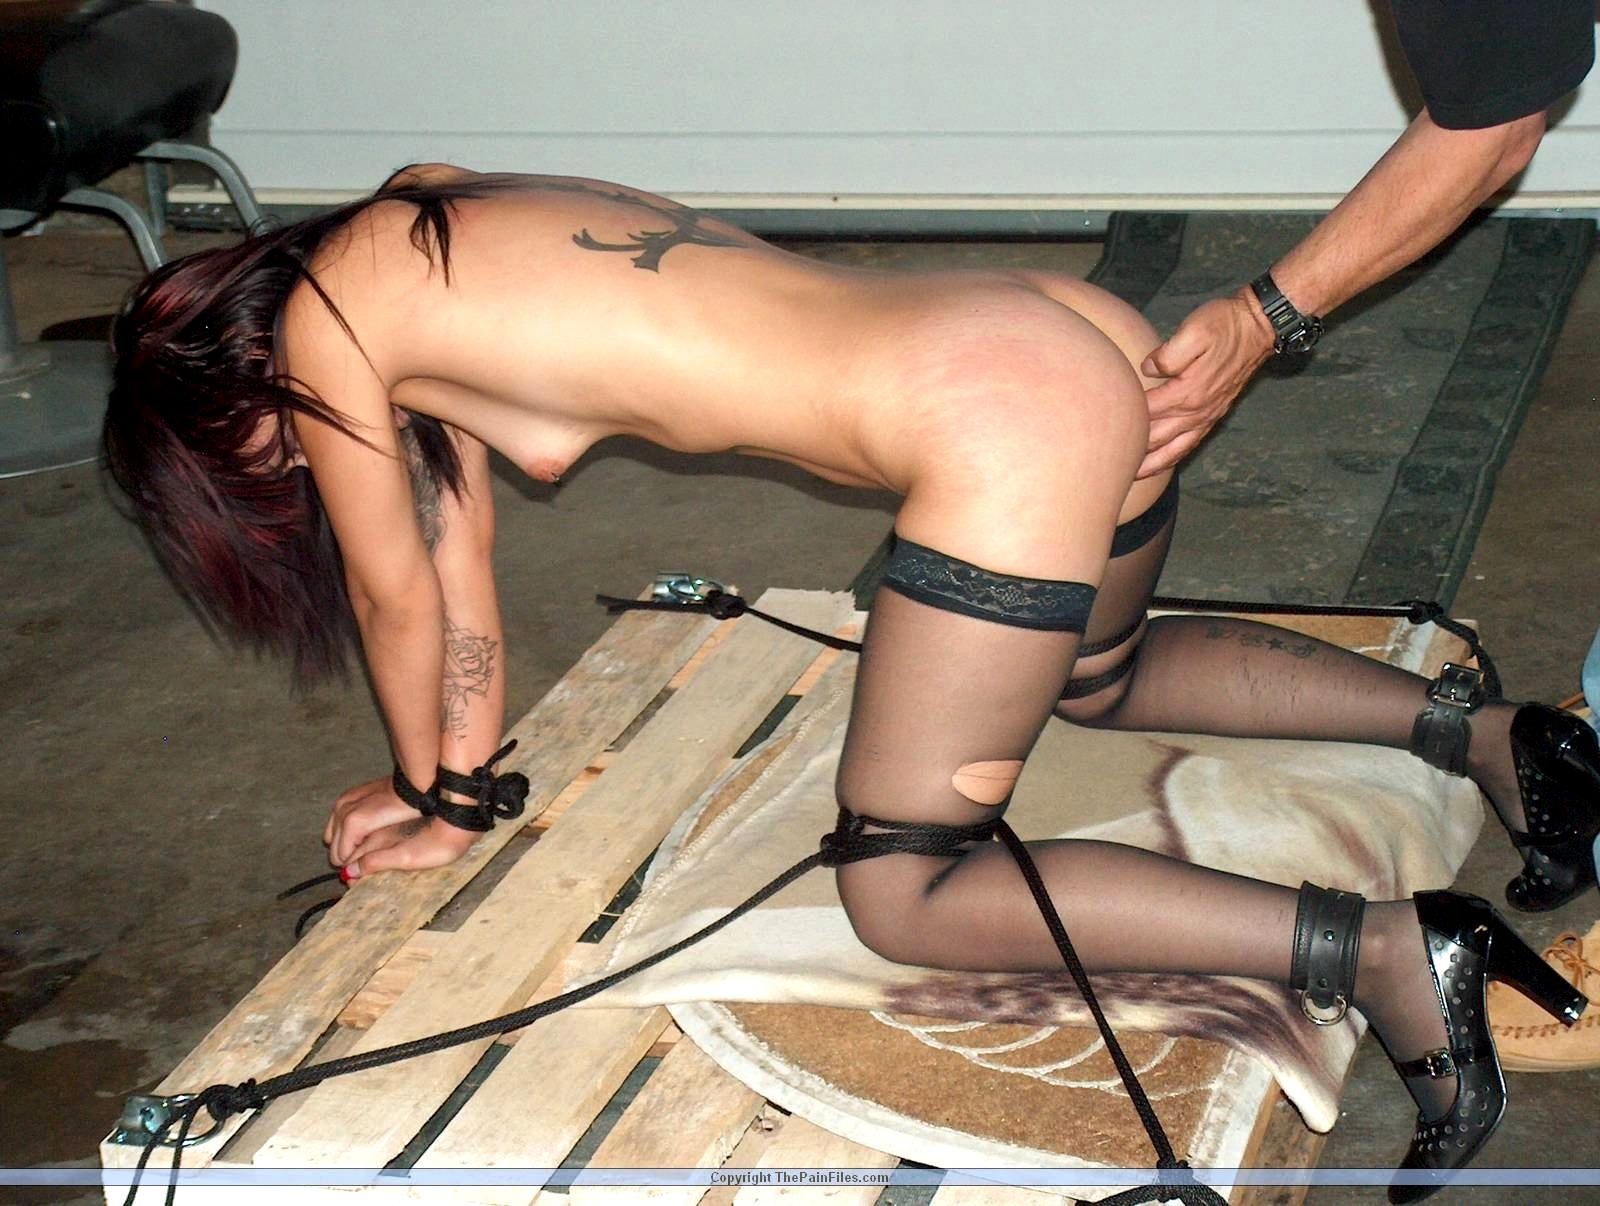 Проститутки бдсм фото фигуристую проститутку